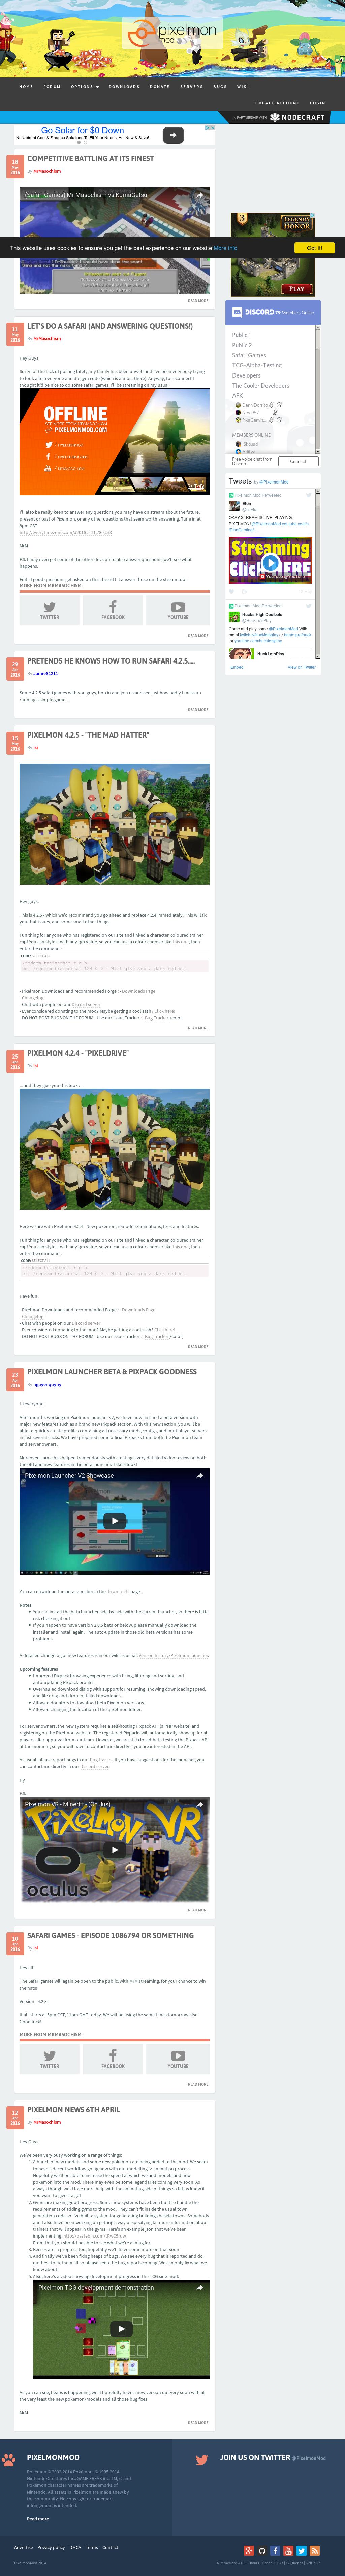 Pixelmon Mod Competitors, Revenue and Employees - Owler Company Profile